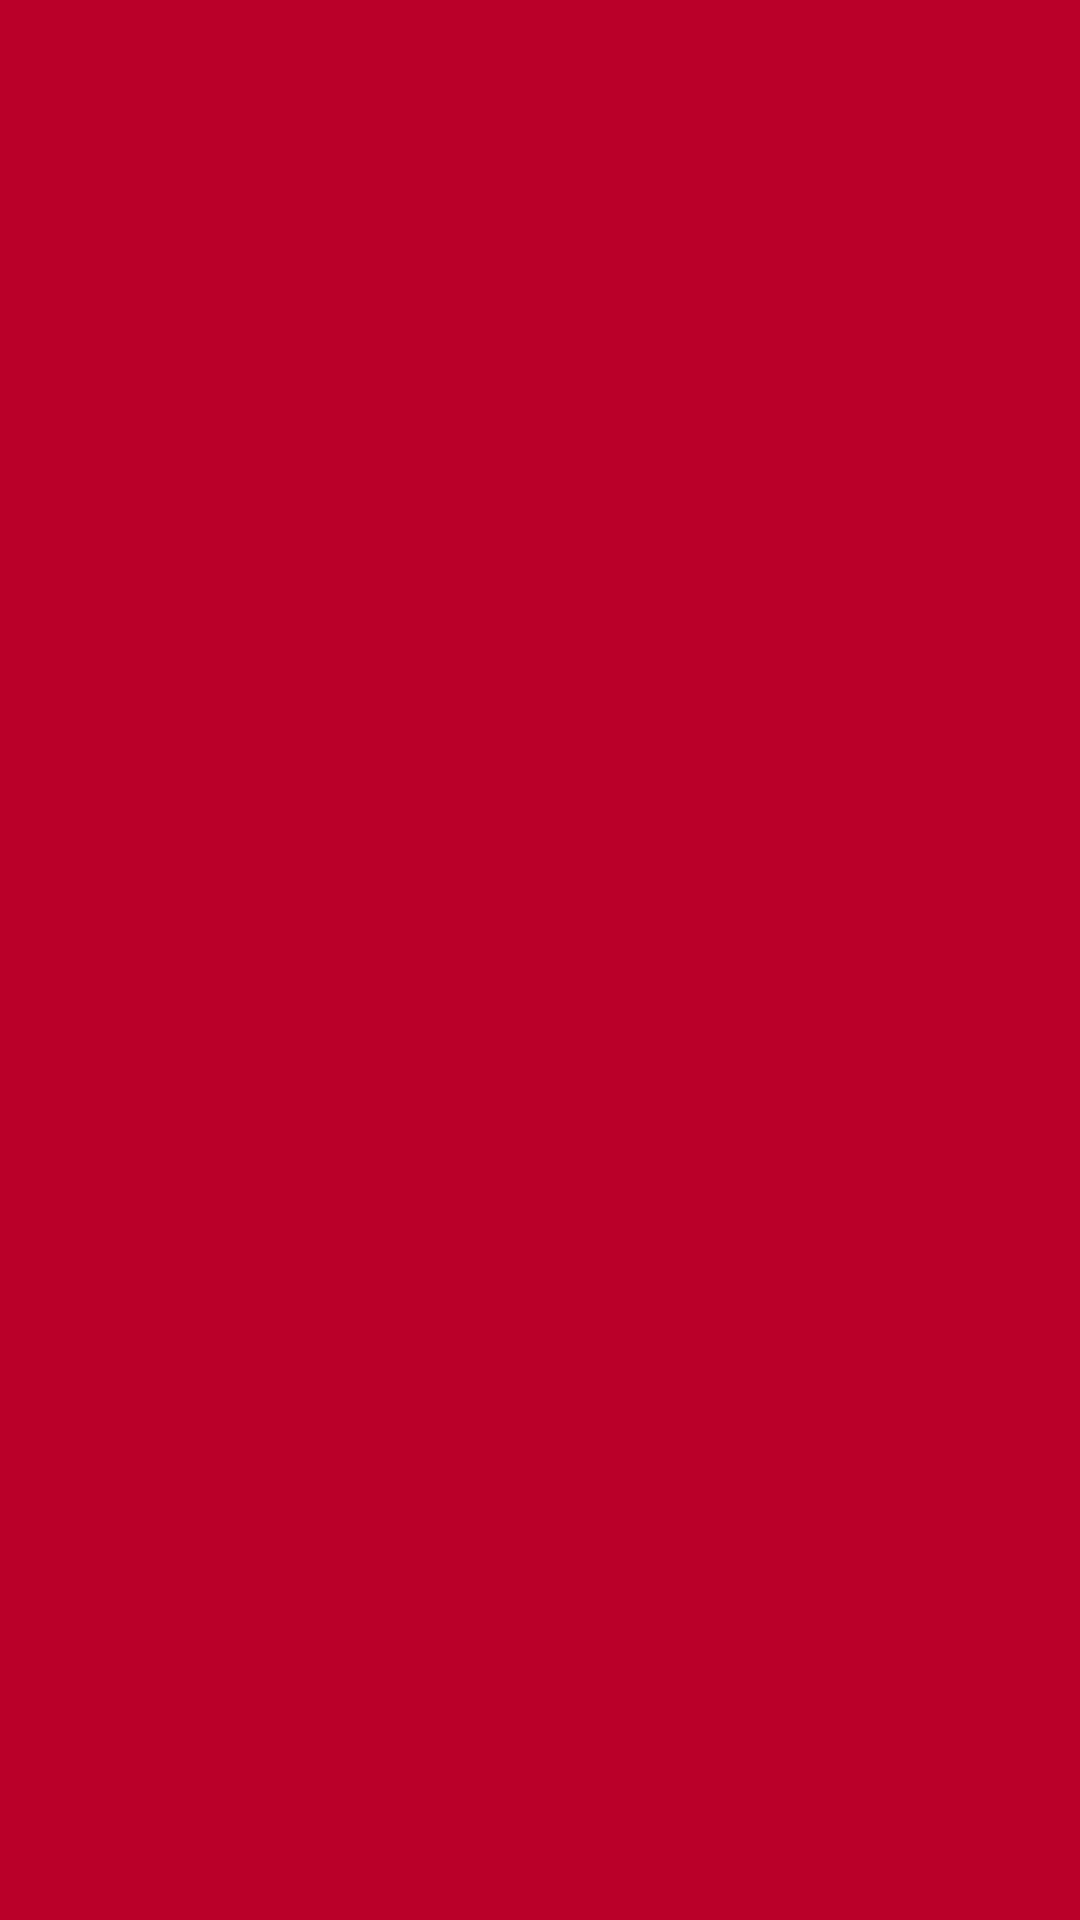 Ba0028 Solid Color Image Https Www Solidcolore Com Ba0028 Htm Solid Color Wallpaper Background Https Www So Red Paint Colors Solid Color Backgrounds